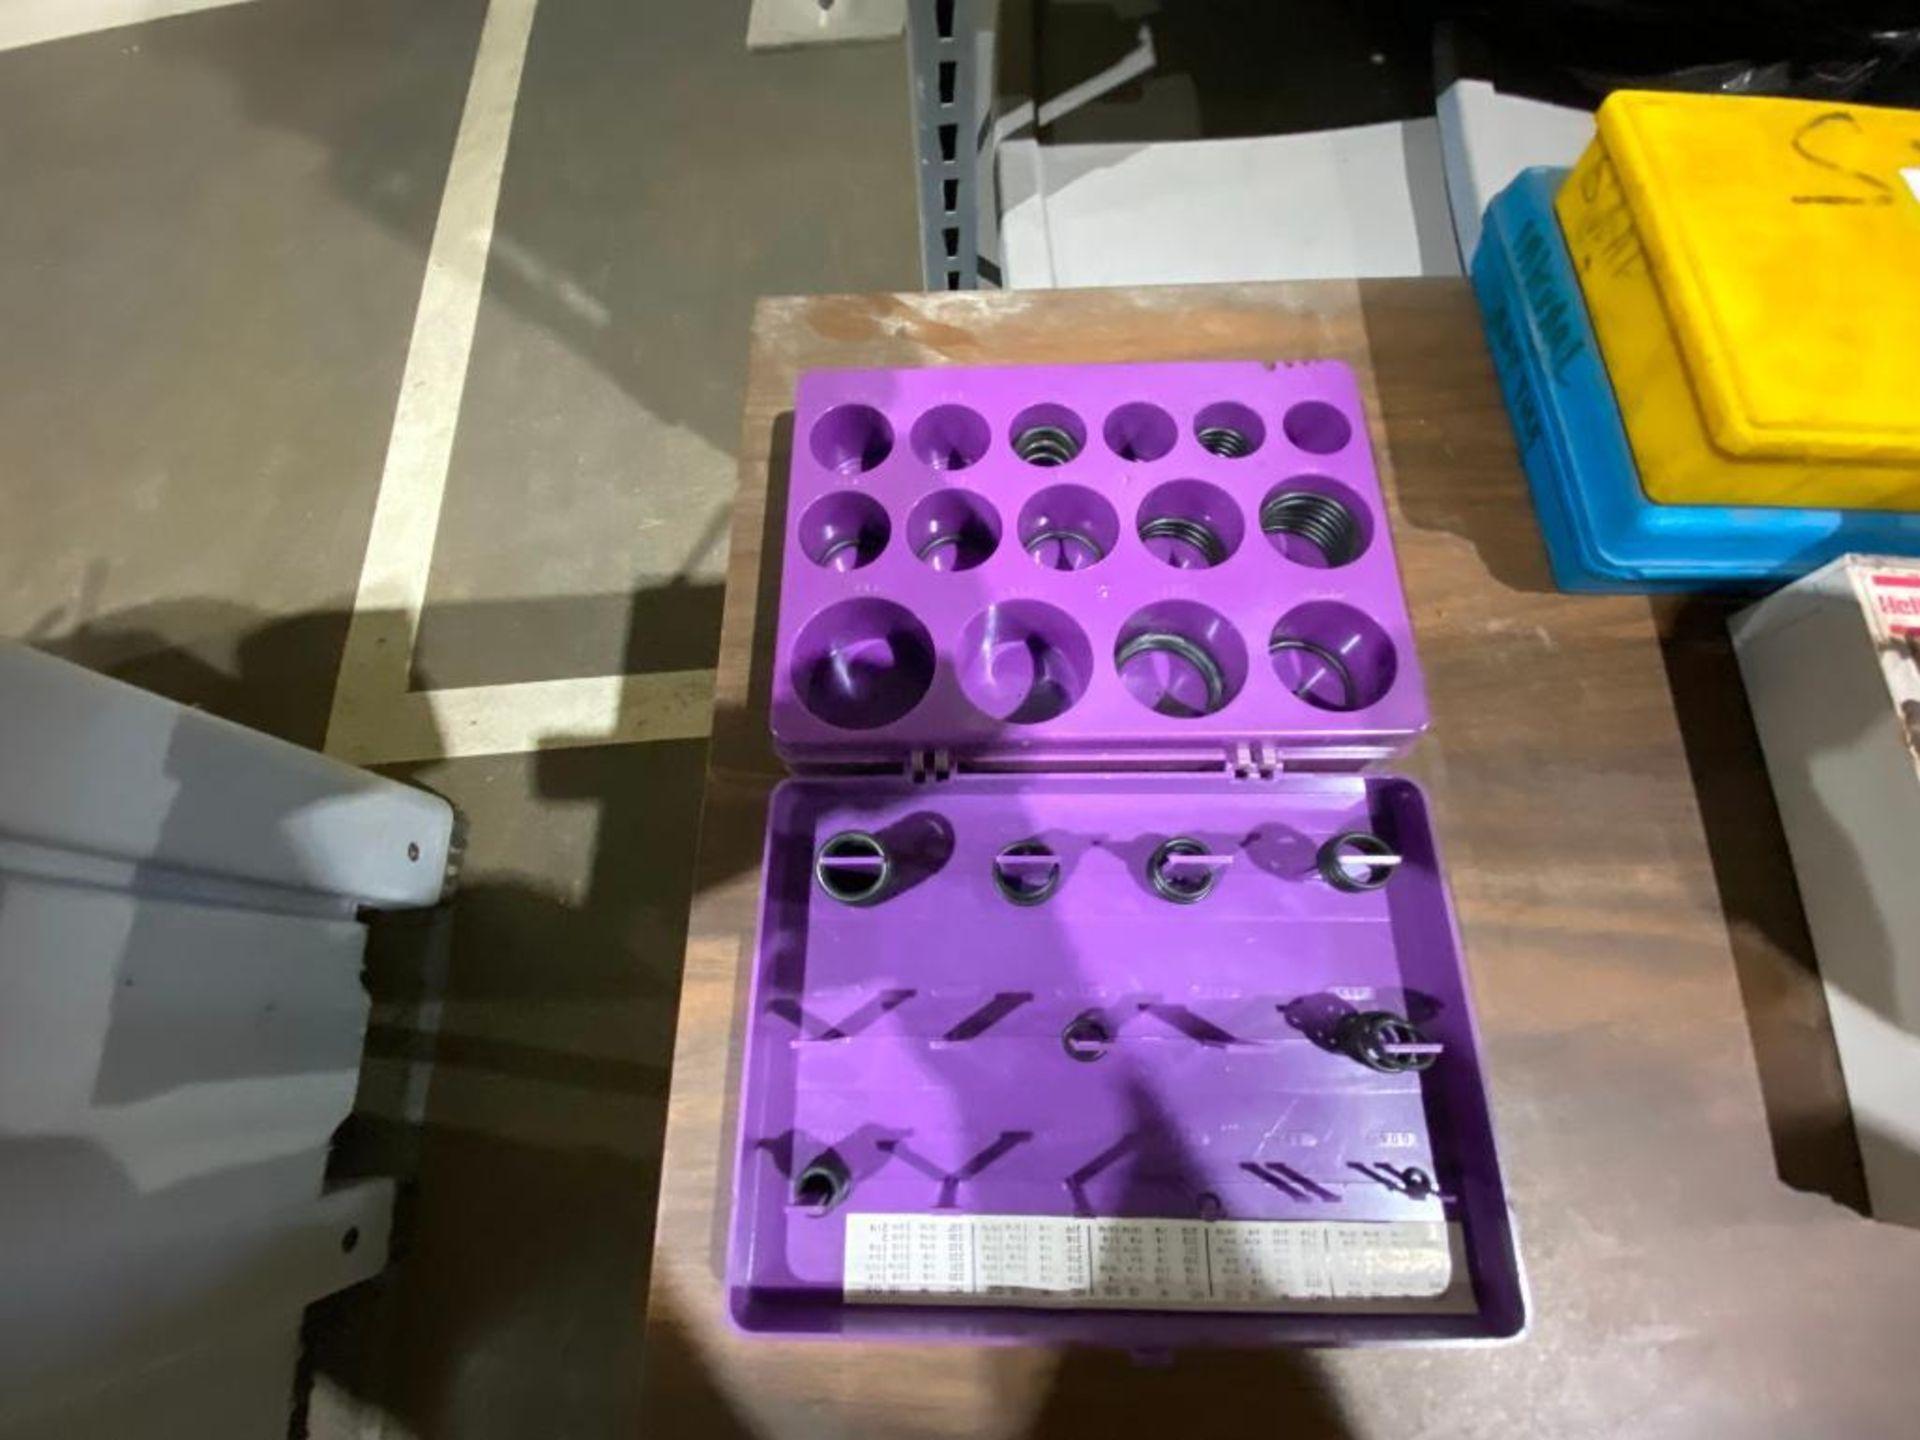 measuring equipment and thread repair - Image 3 of 18